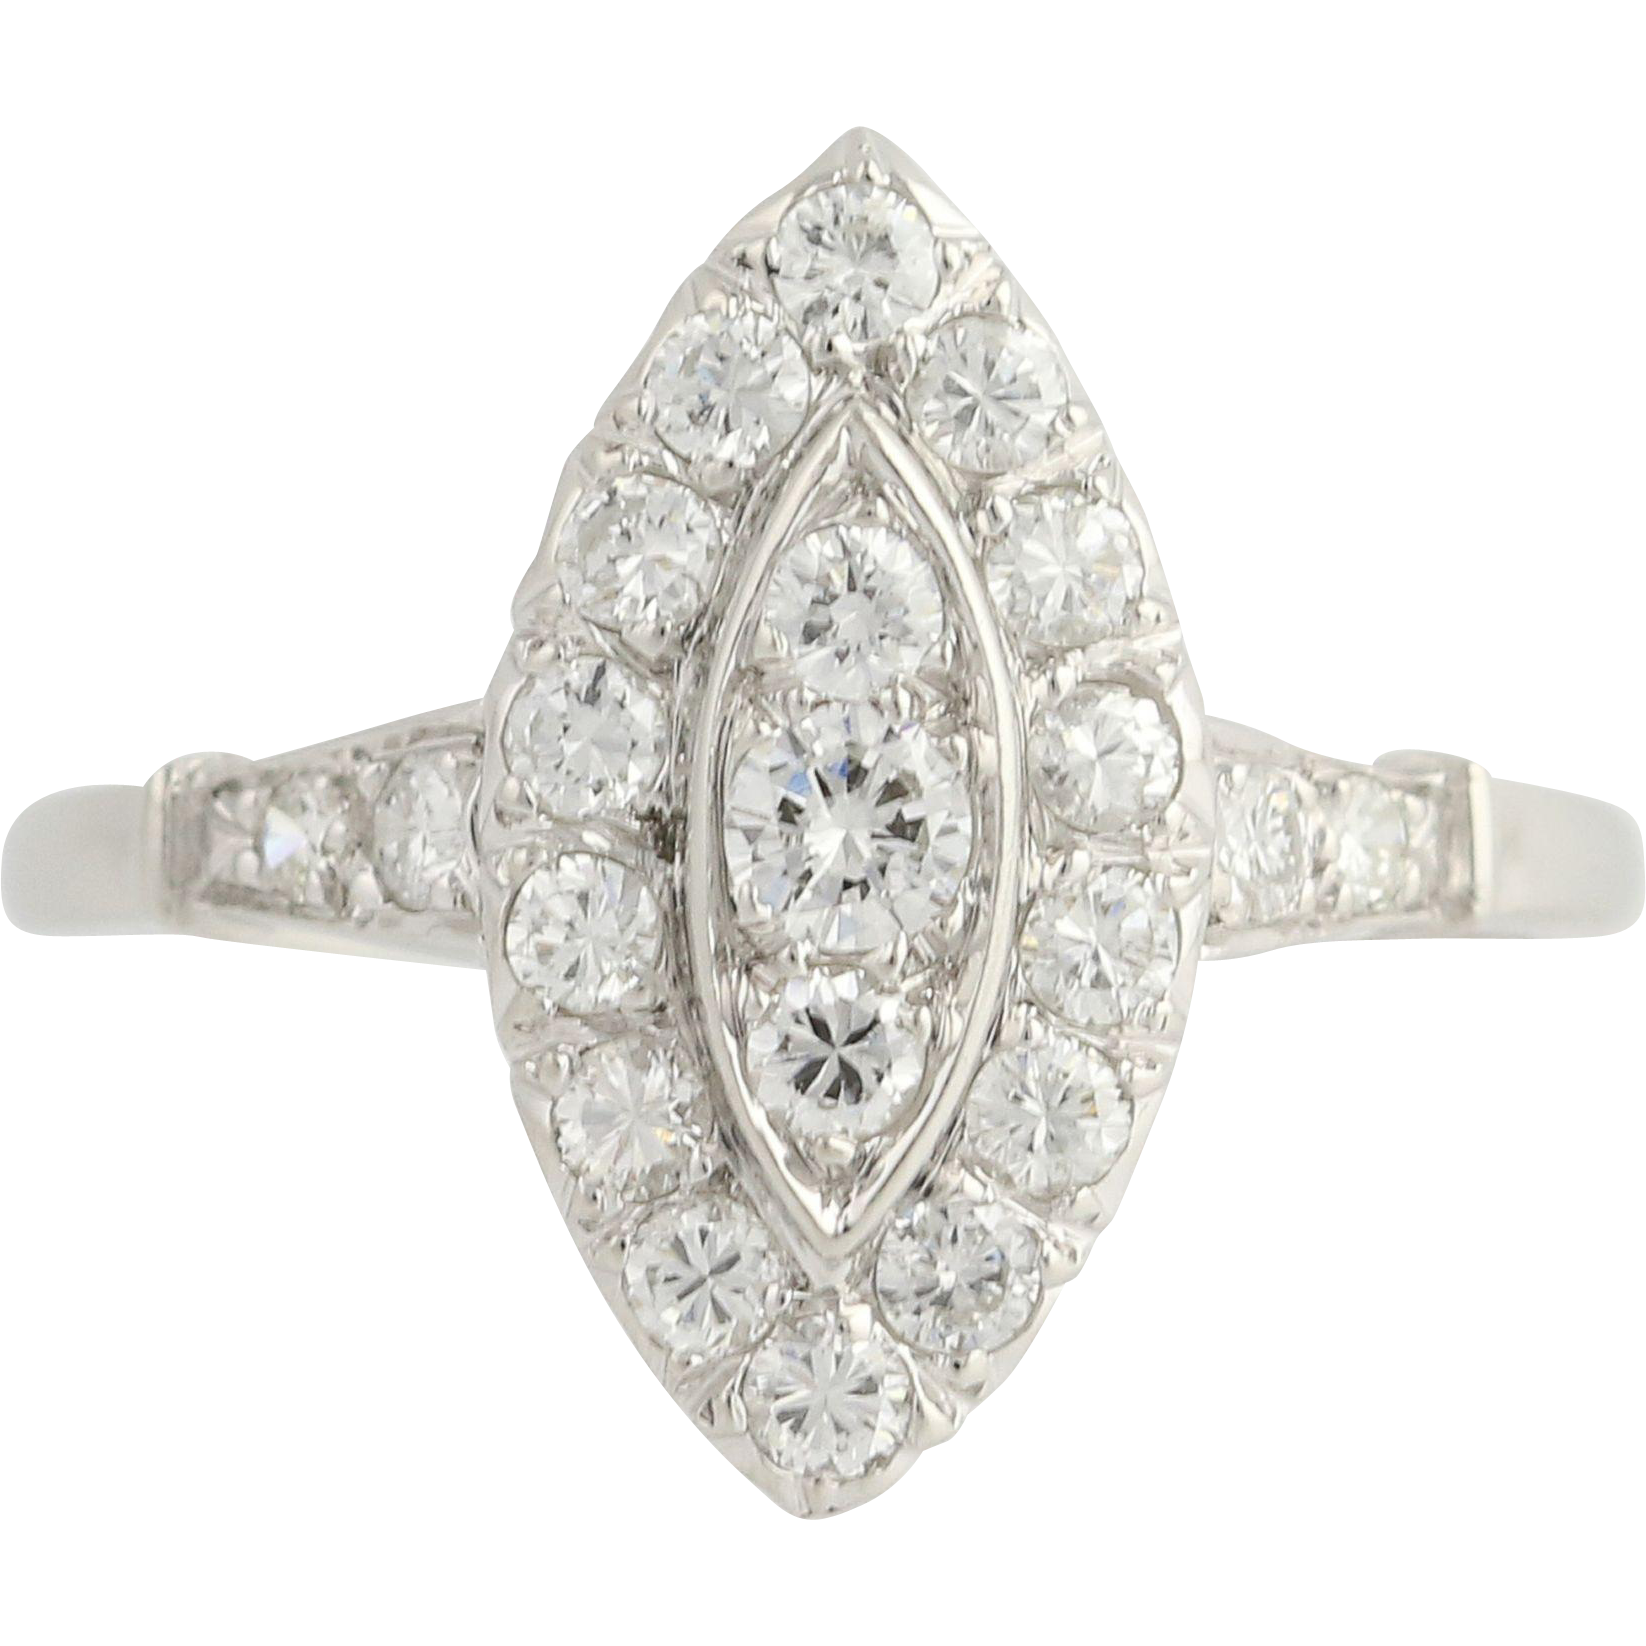 Art Deco Diamond Cocktail Ring - 900 Platinum Women's Size 8 3/4 Genuine 1.03ctw